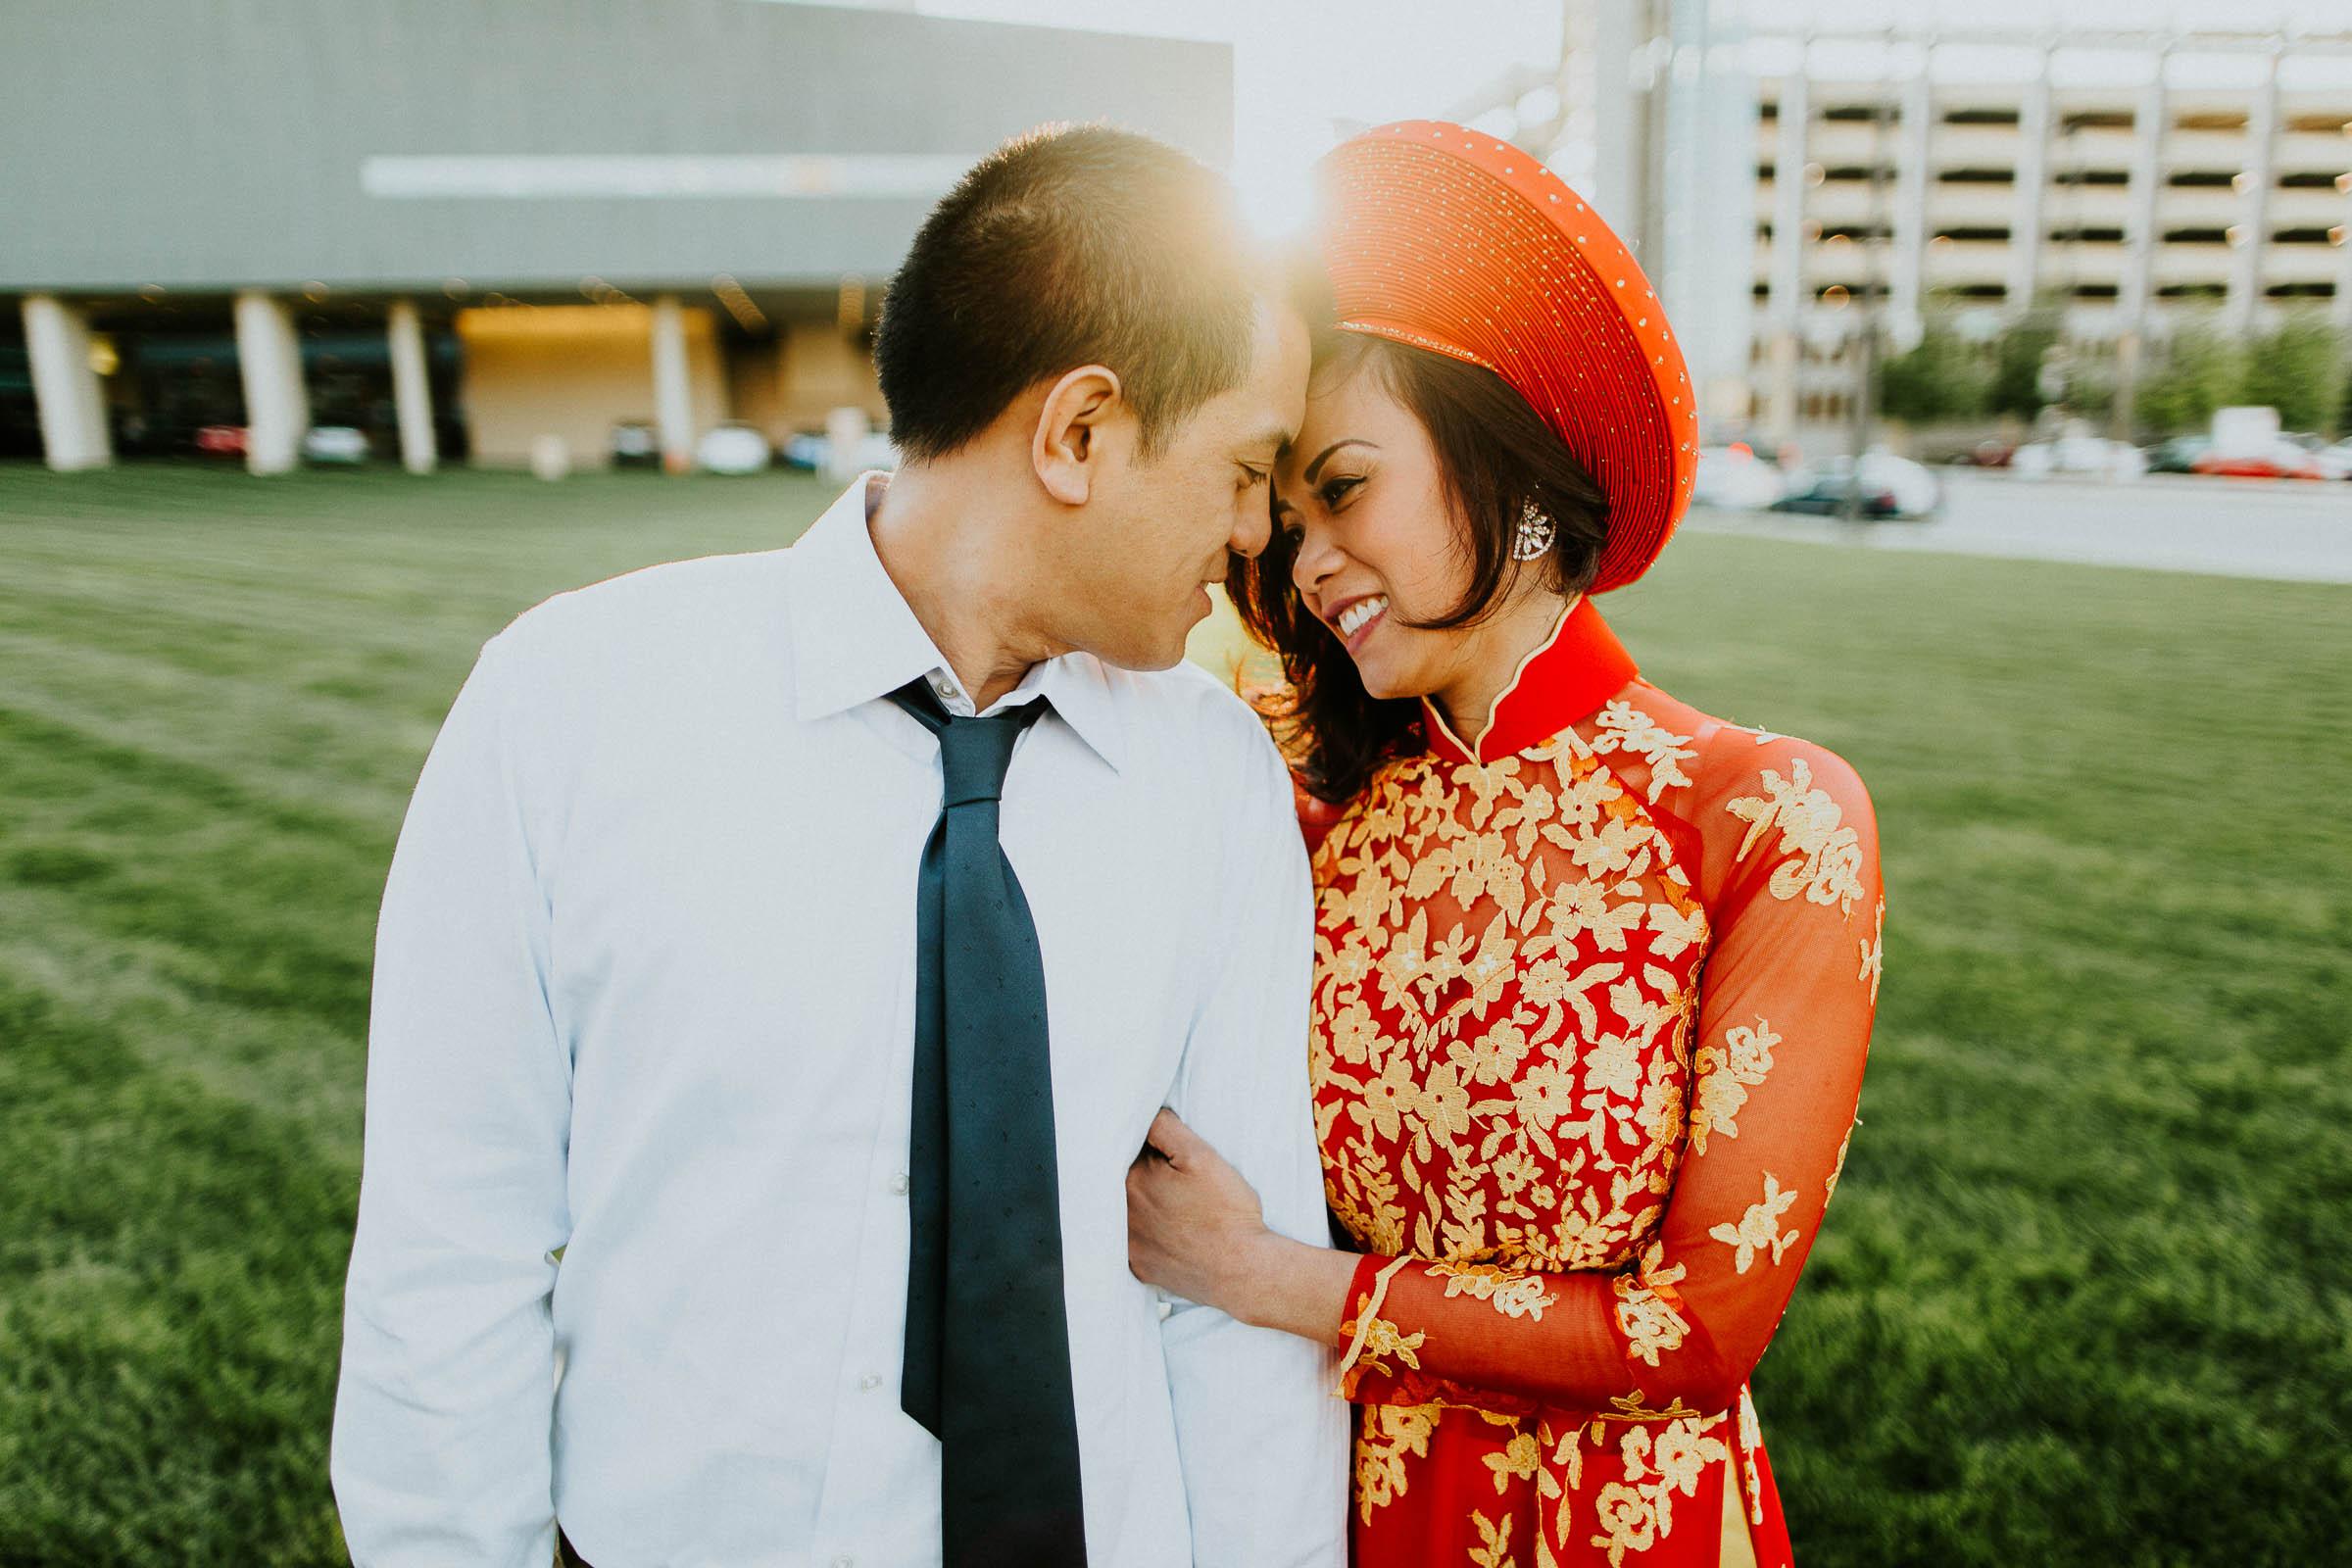 Steve + Tina  Vietnam Styled Engagement Session in Downtown Omaha, Nebraska   VIEW